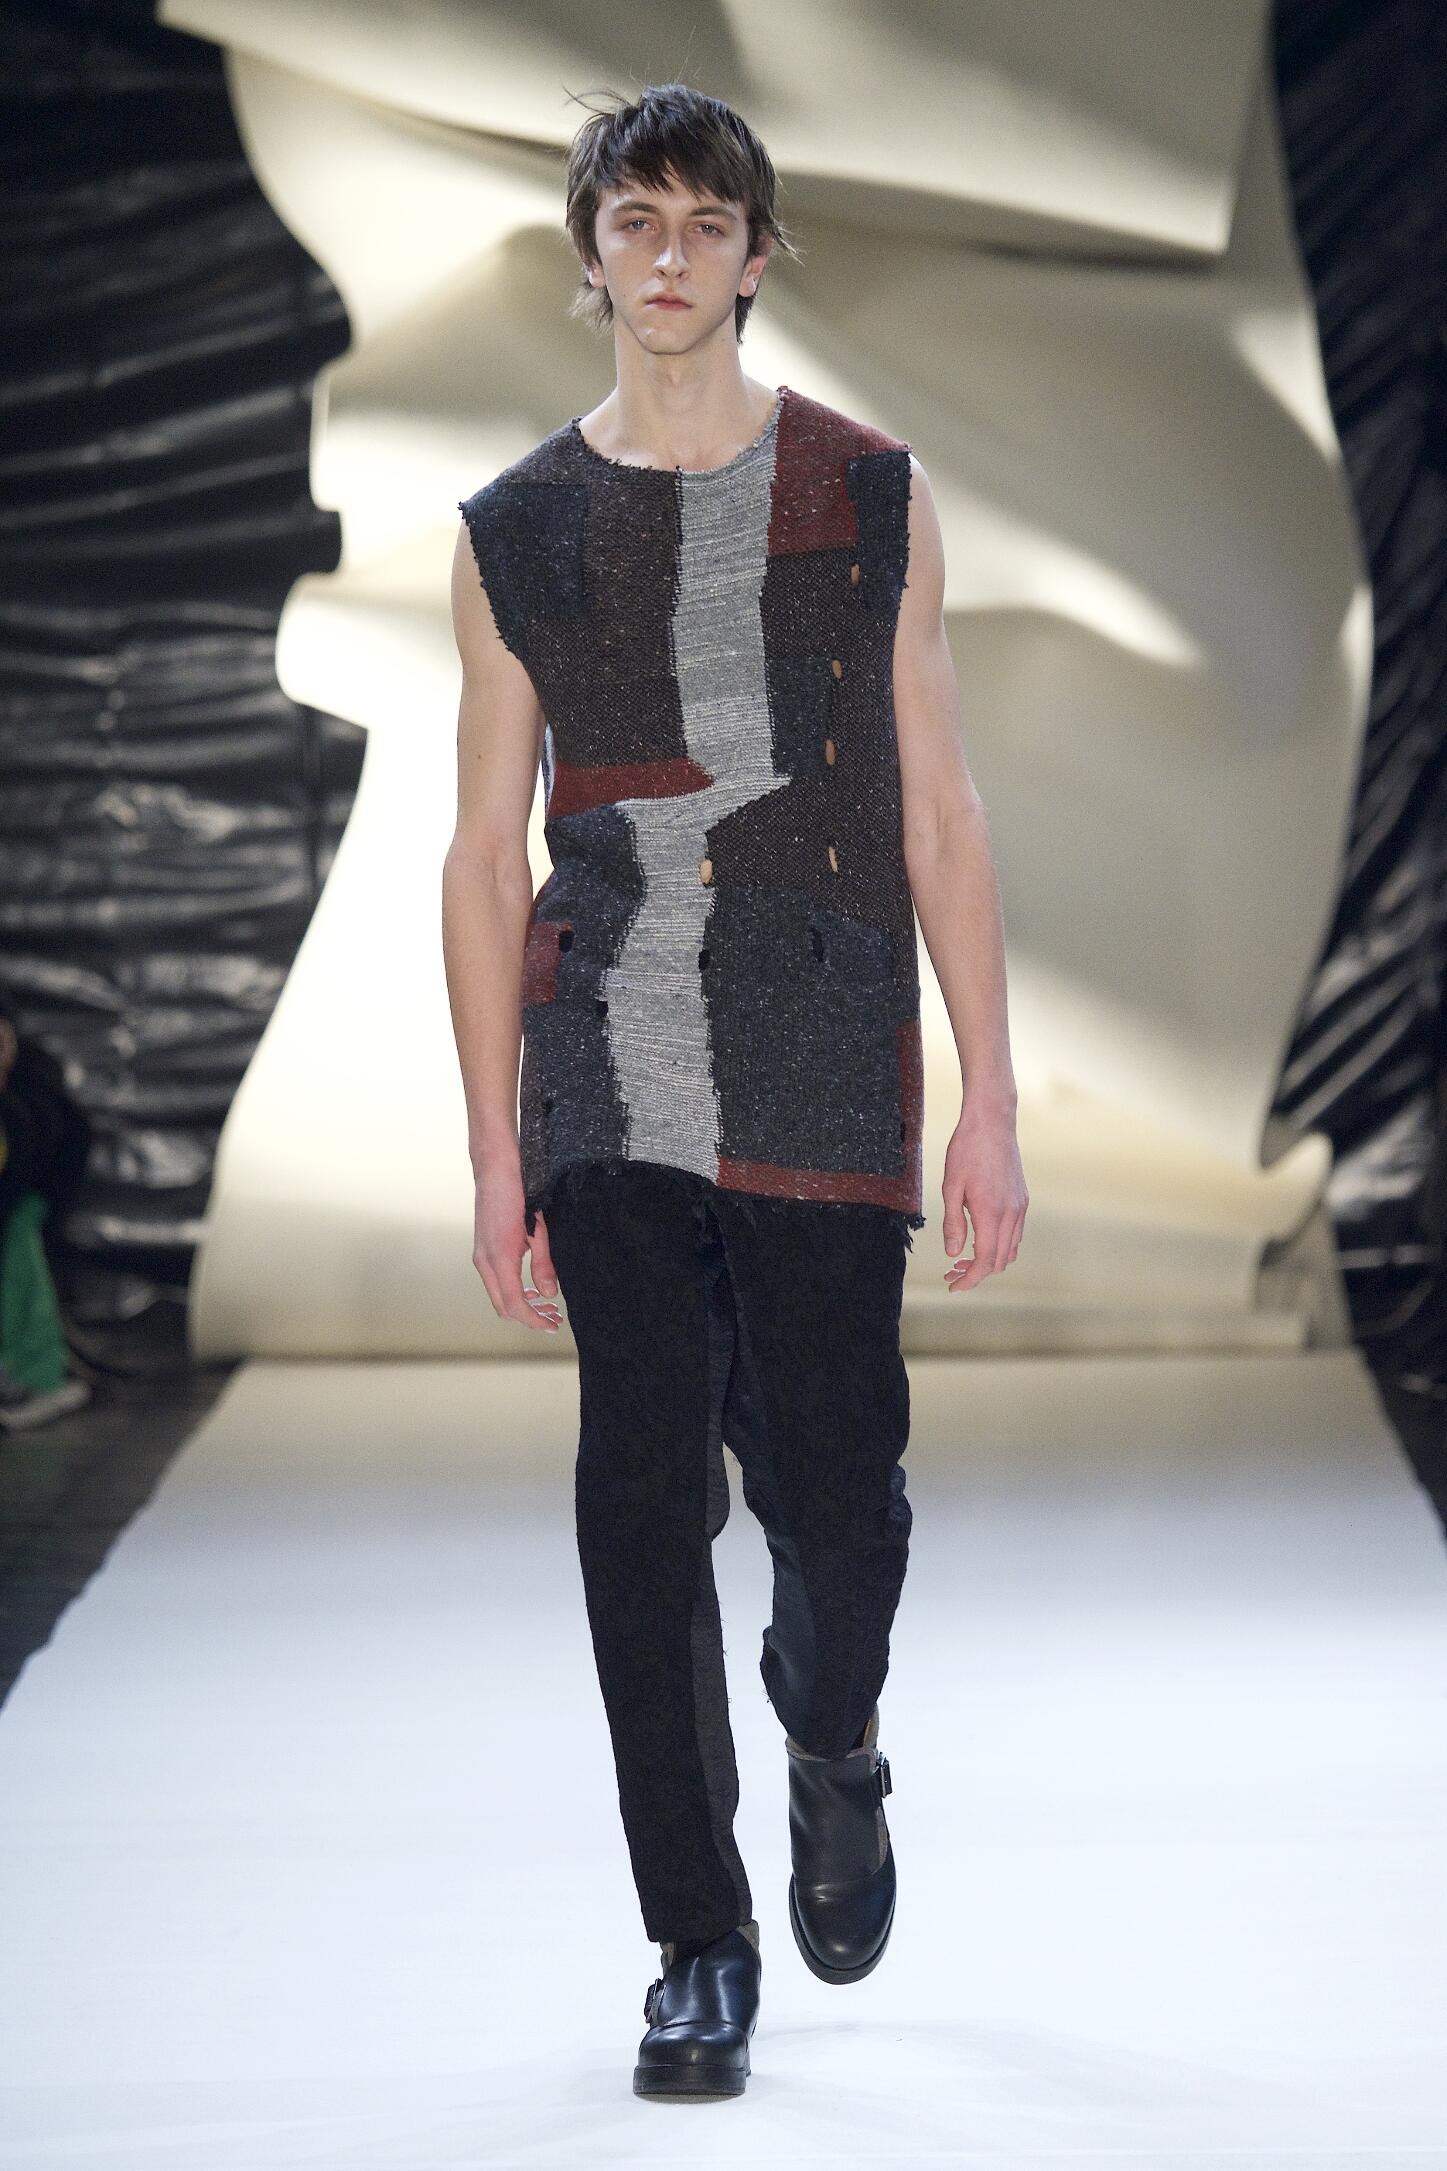 Damir Doma Fall Winter 2015 16 Men's Collection Paris Fashion Week Fashion Show